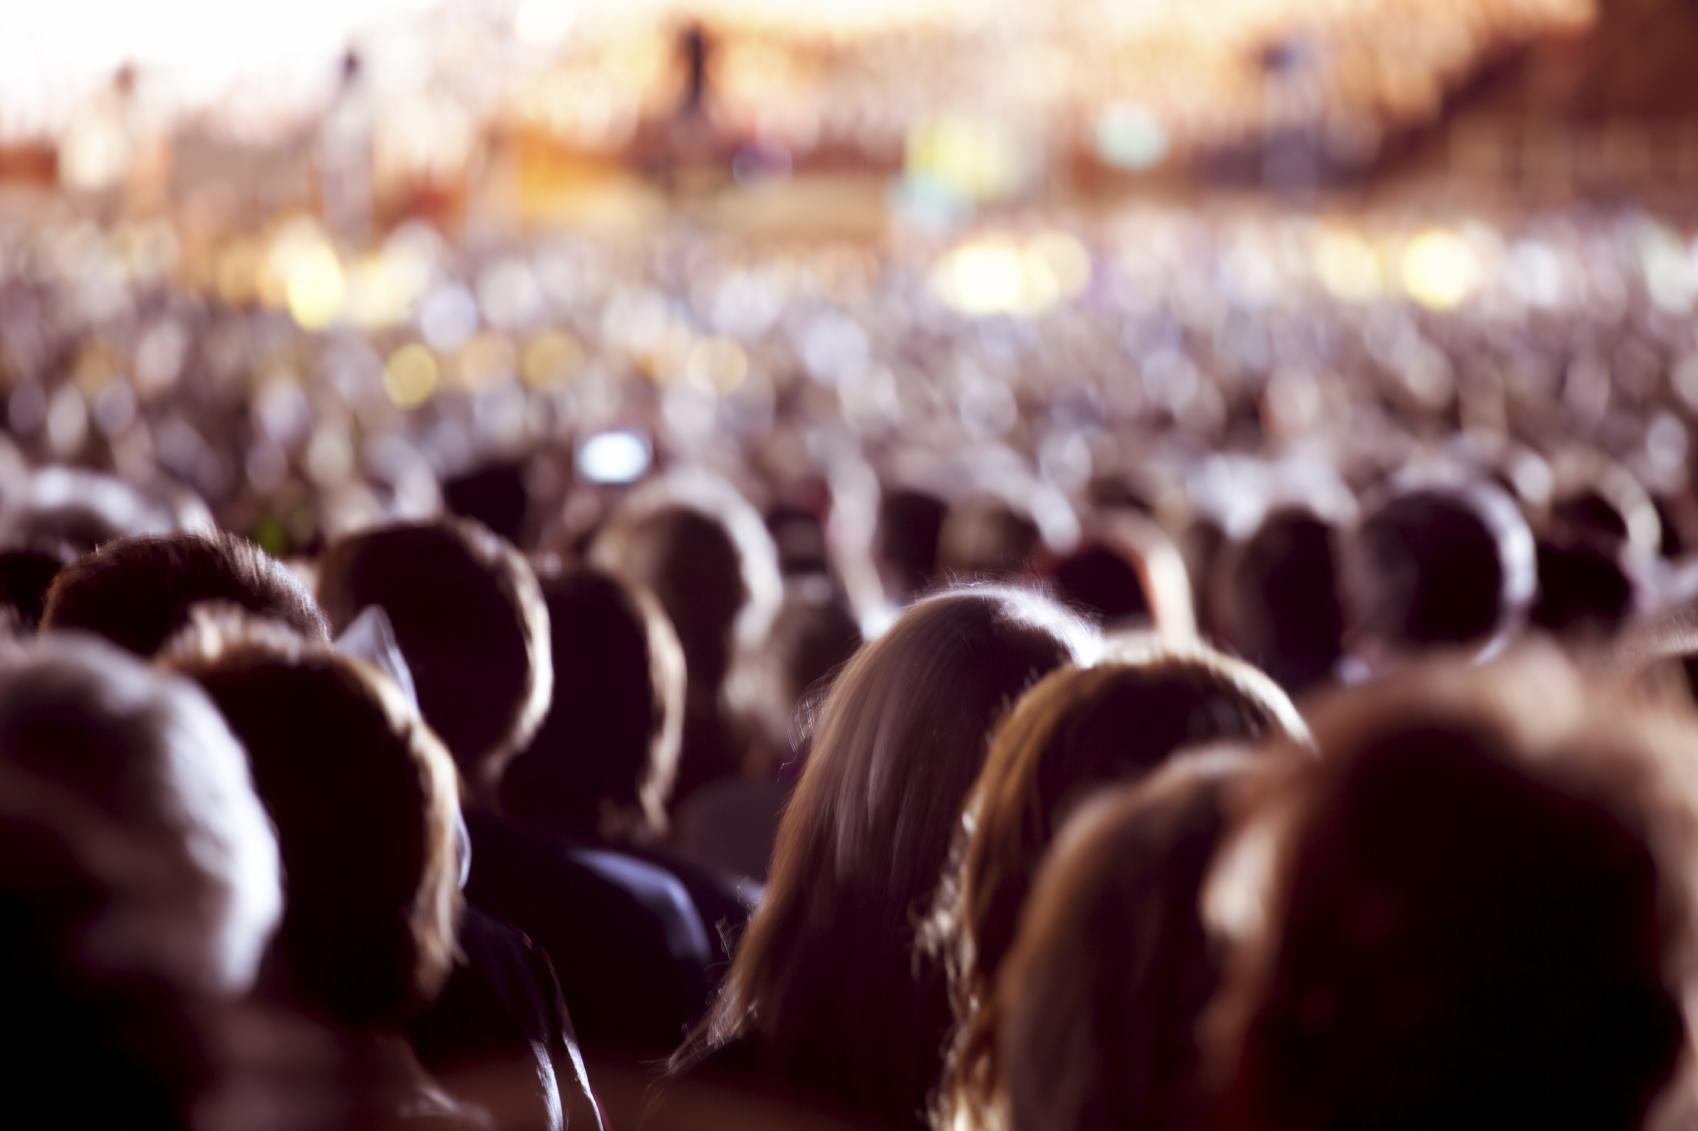 MILESTONE: 1,000 Prayers Sent in One Day